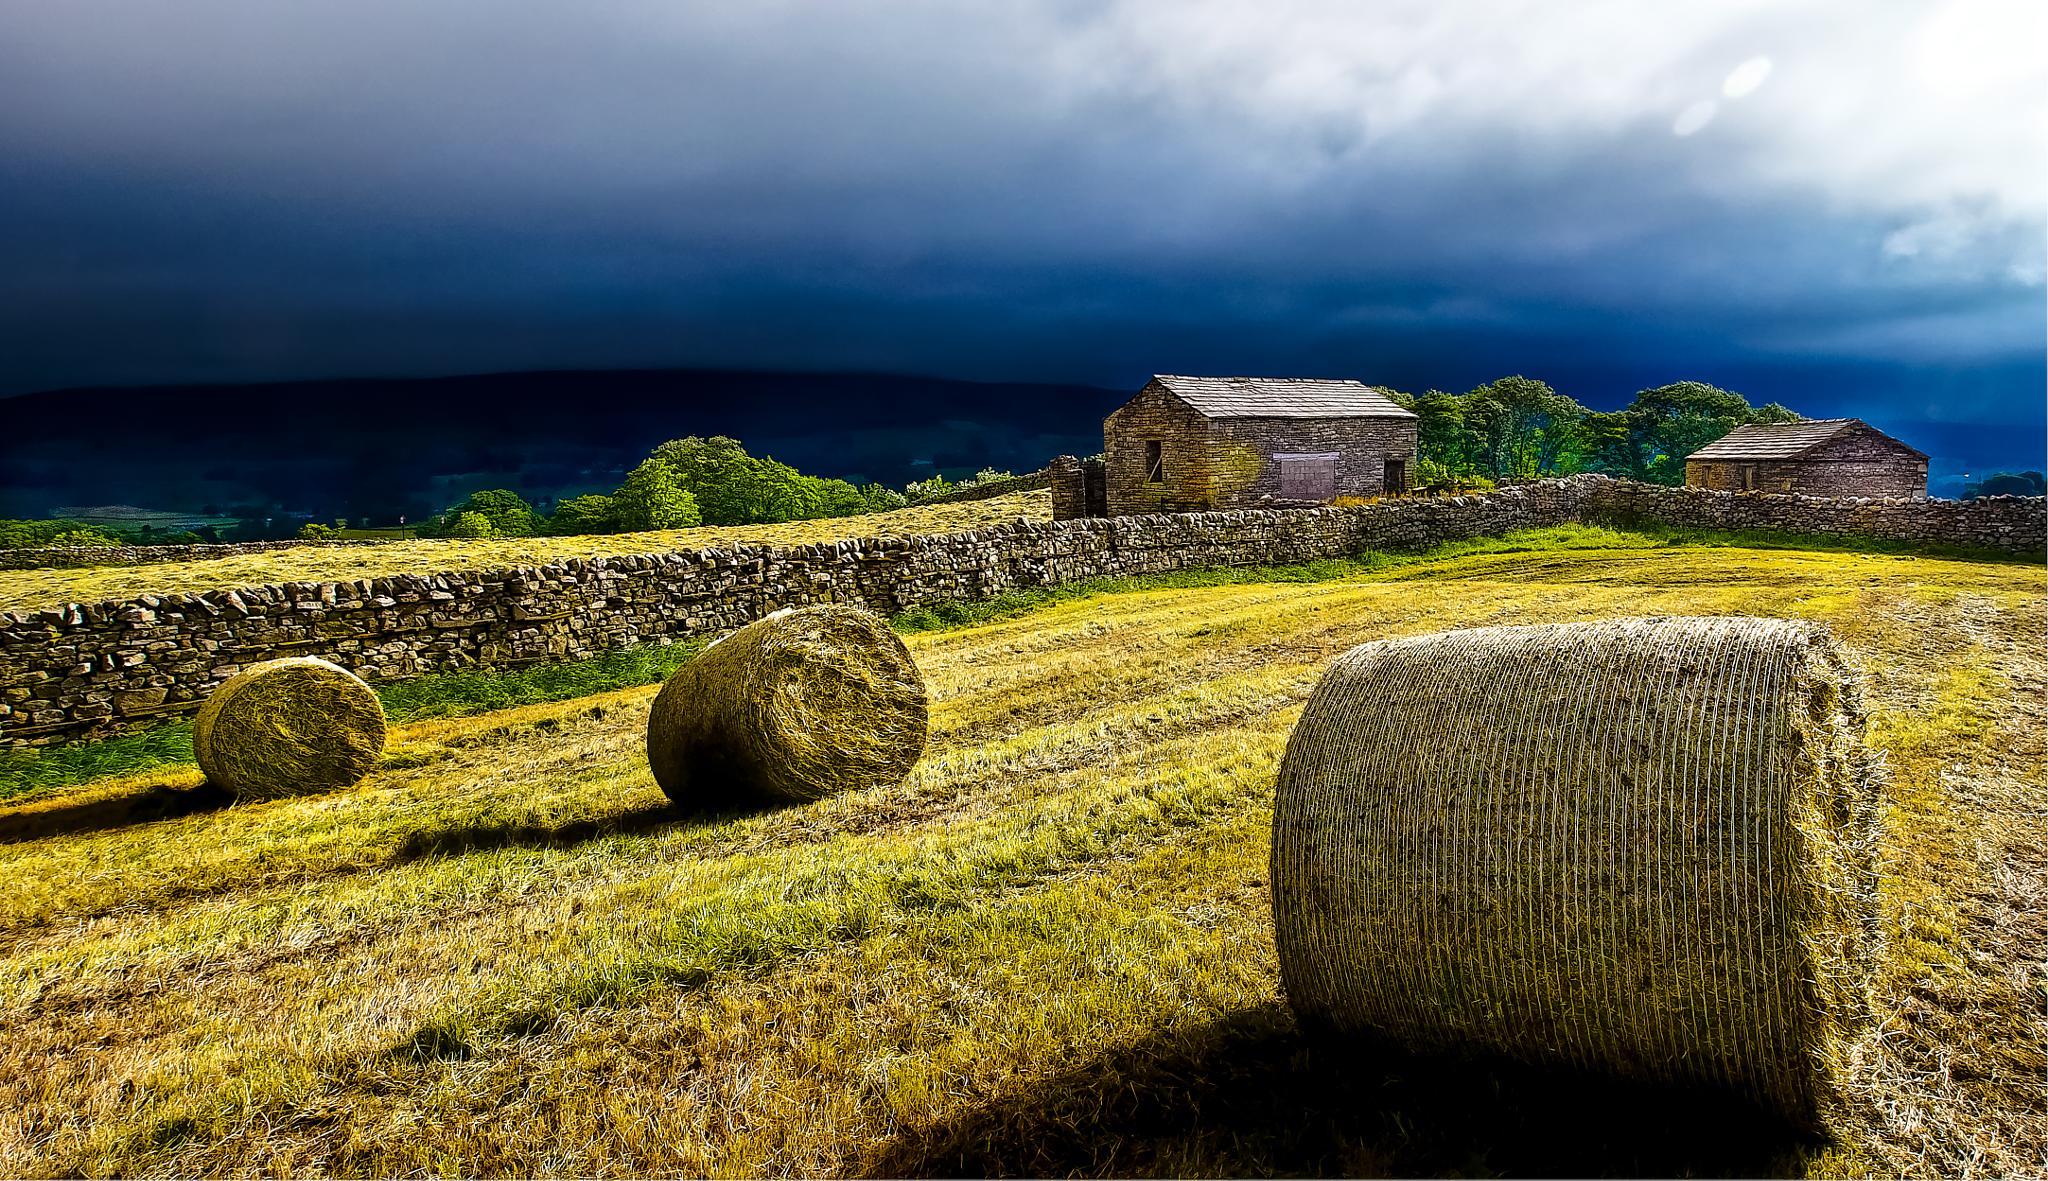 Dry stone barns by Peter Edwardo Vicente.